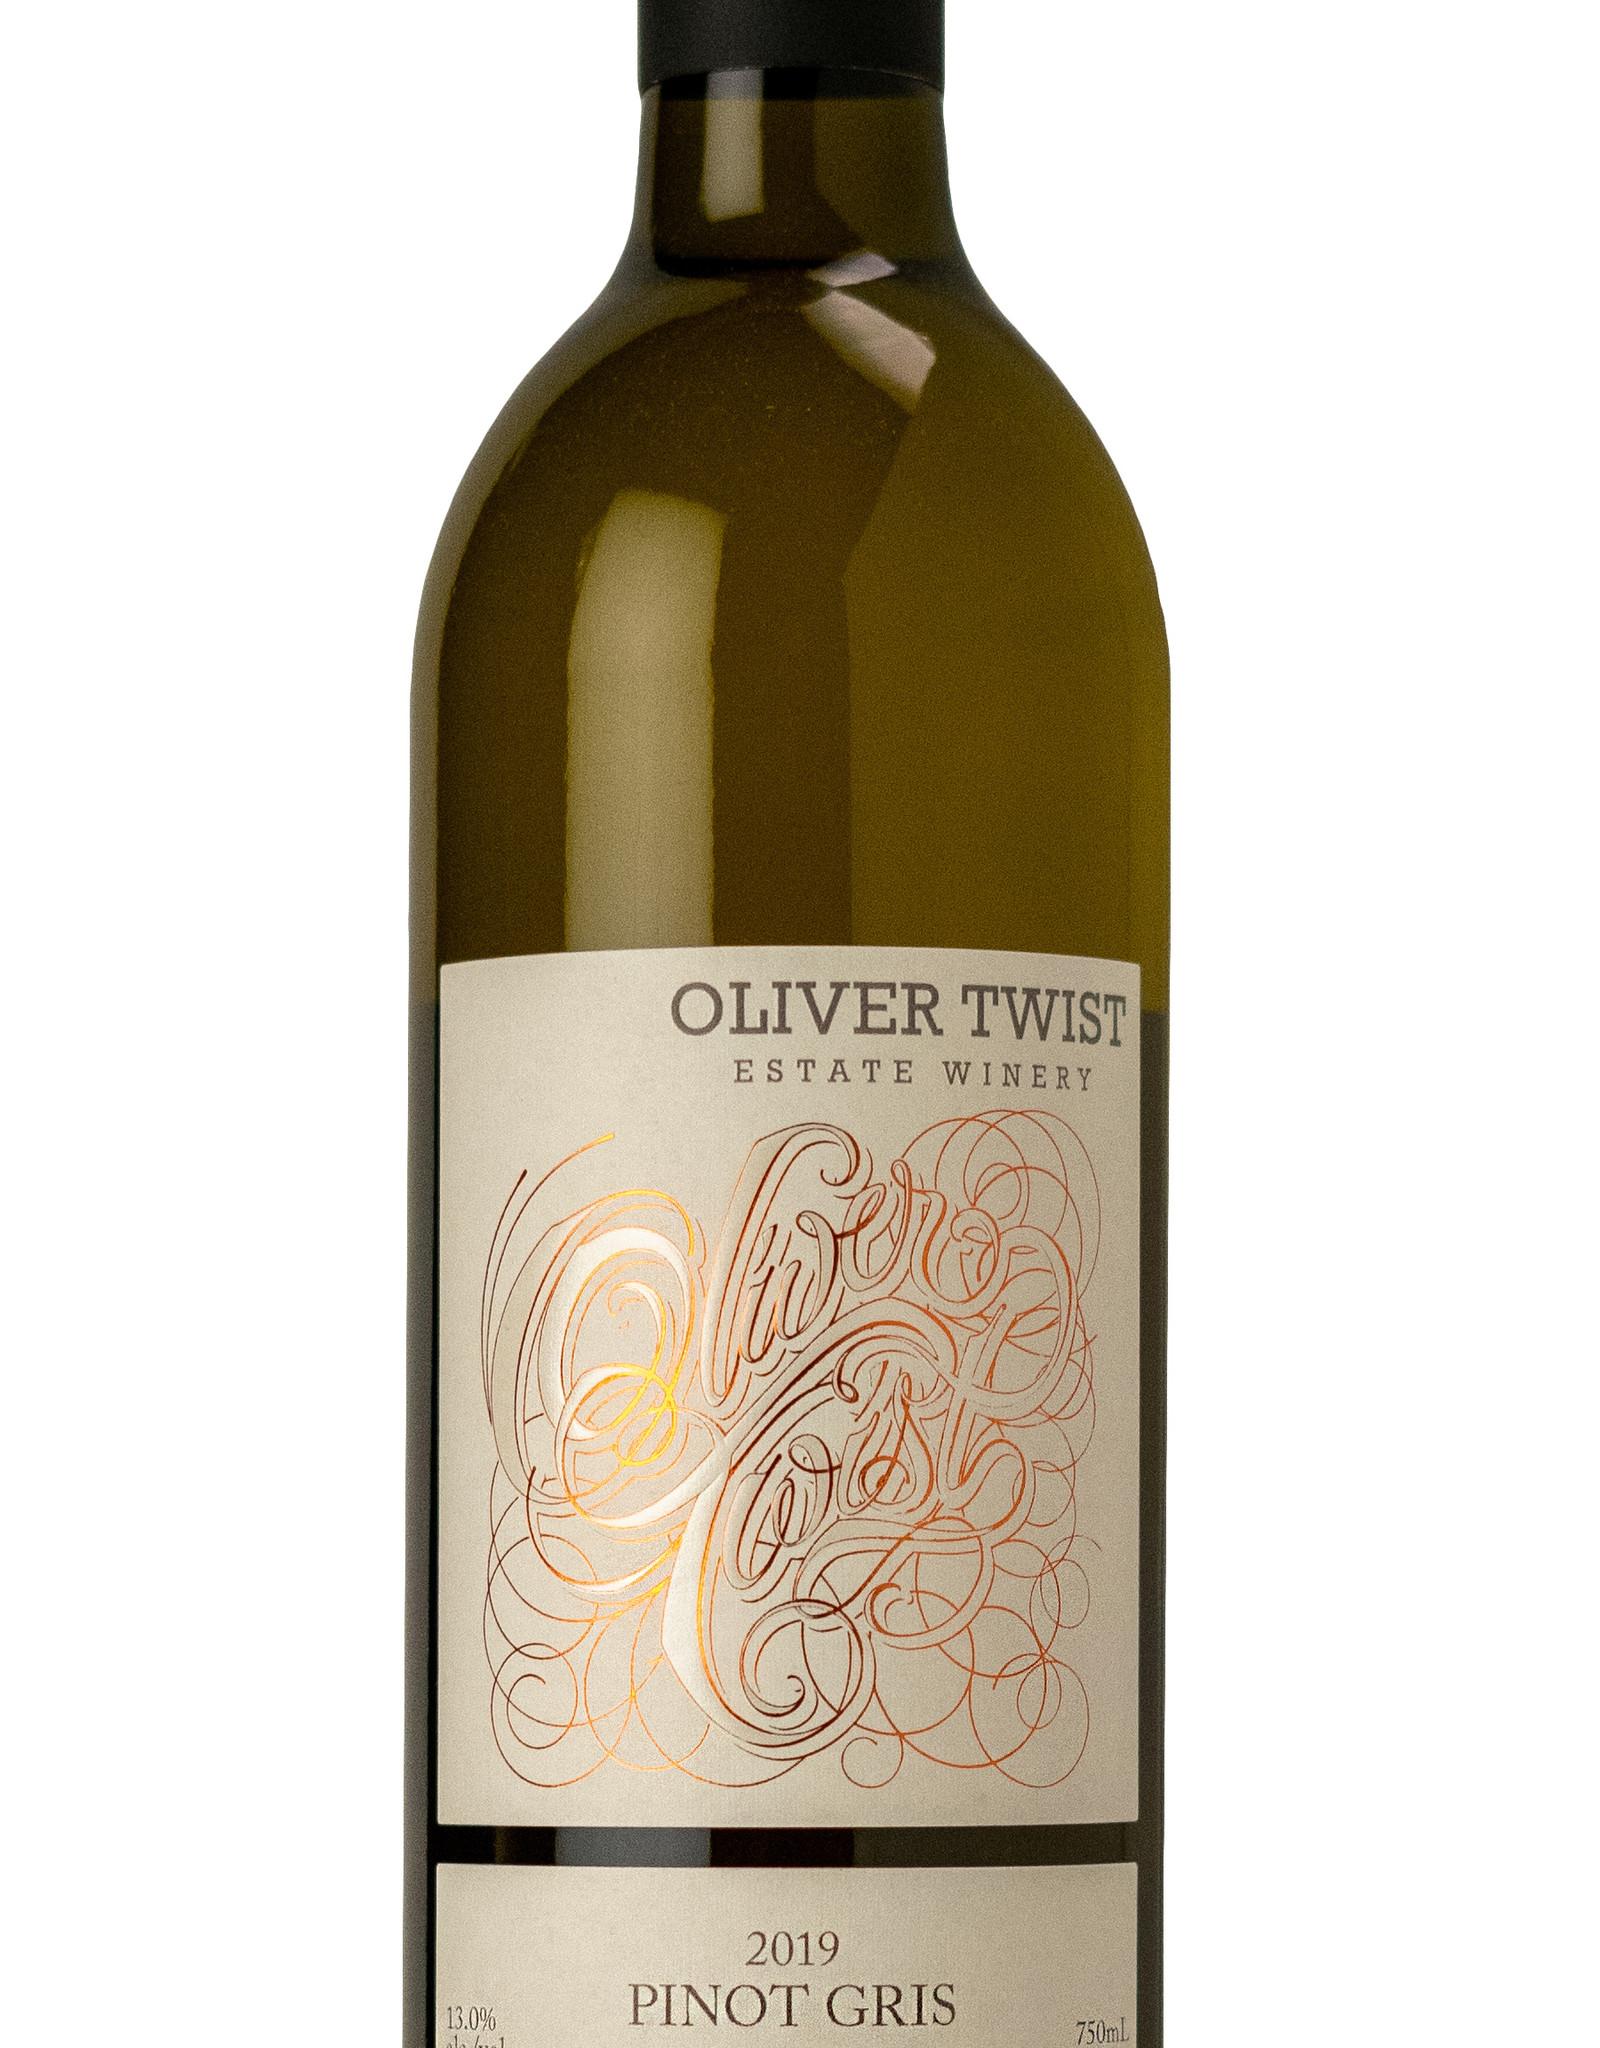 Oliver Twist 2019 Pinot Gris 750ml